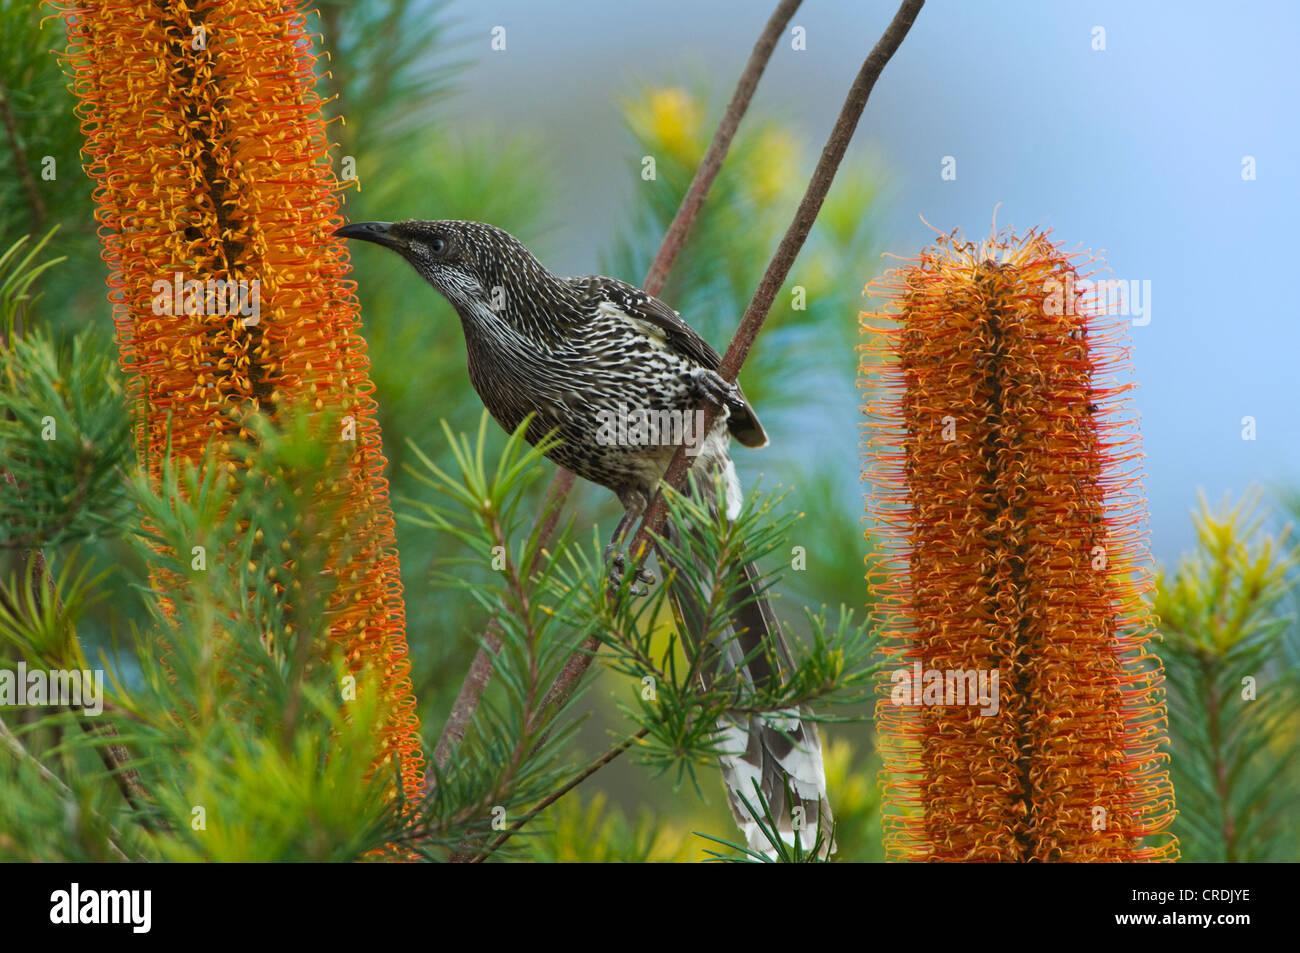 Little Wattlebird (Anthochaera chrysoptera) on Banksia spinulosa x ericifolia (Giant Candles) - Stock Image